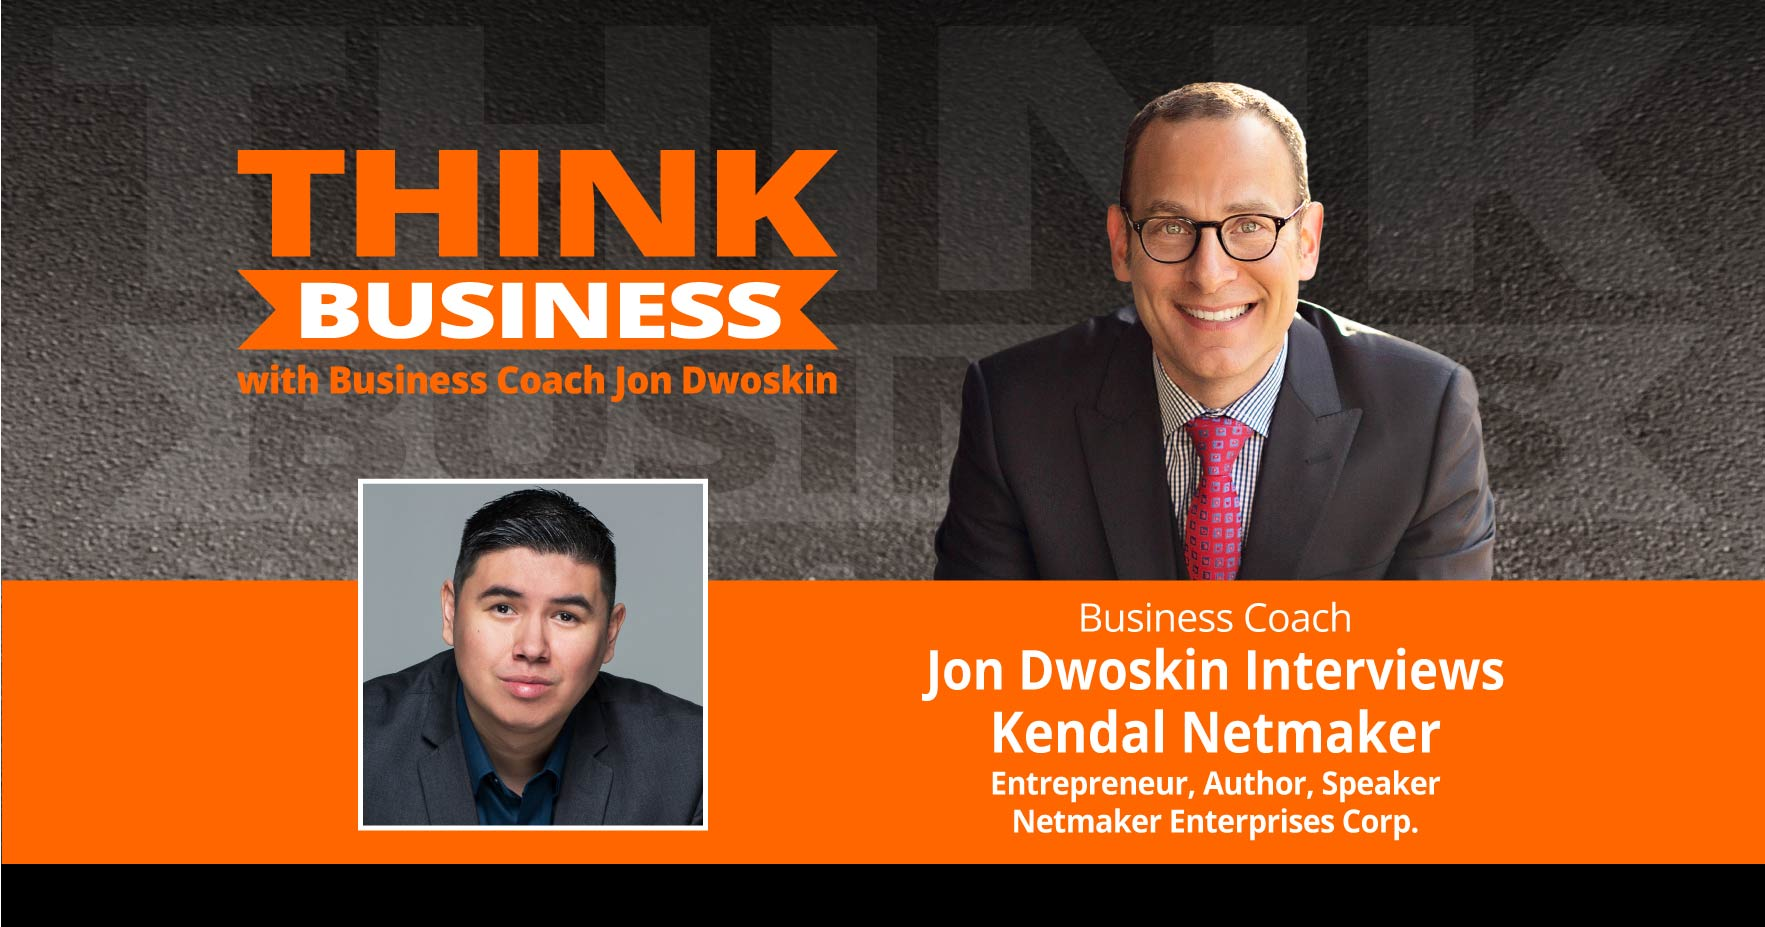 THINK Business Podcast: Jon Dwoskin Talks with Kendal Netmaker